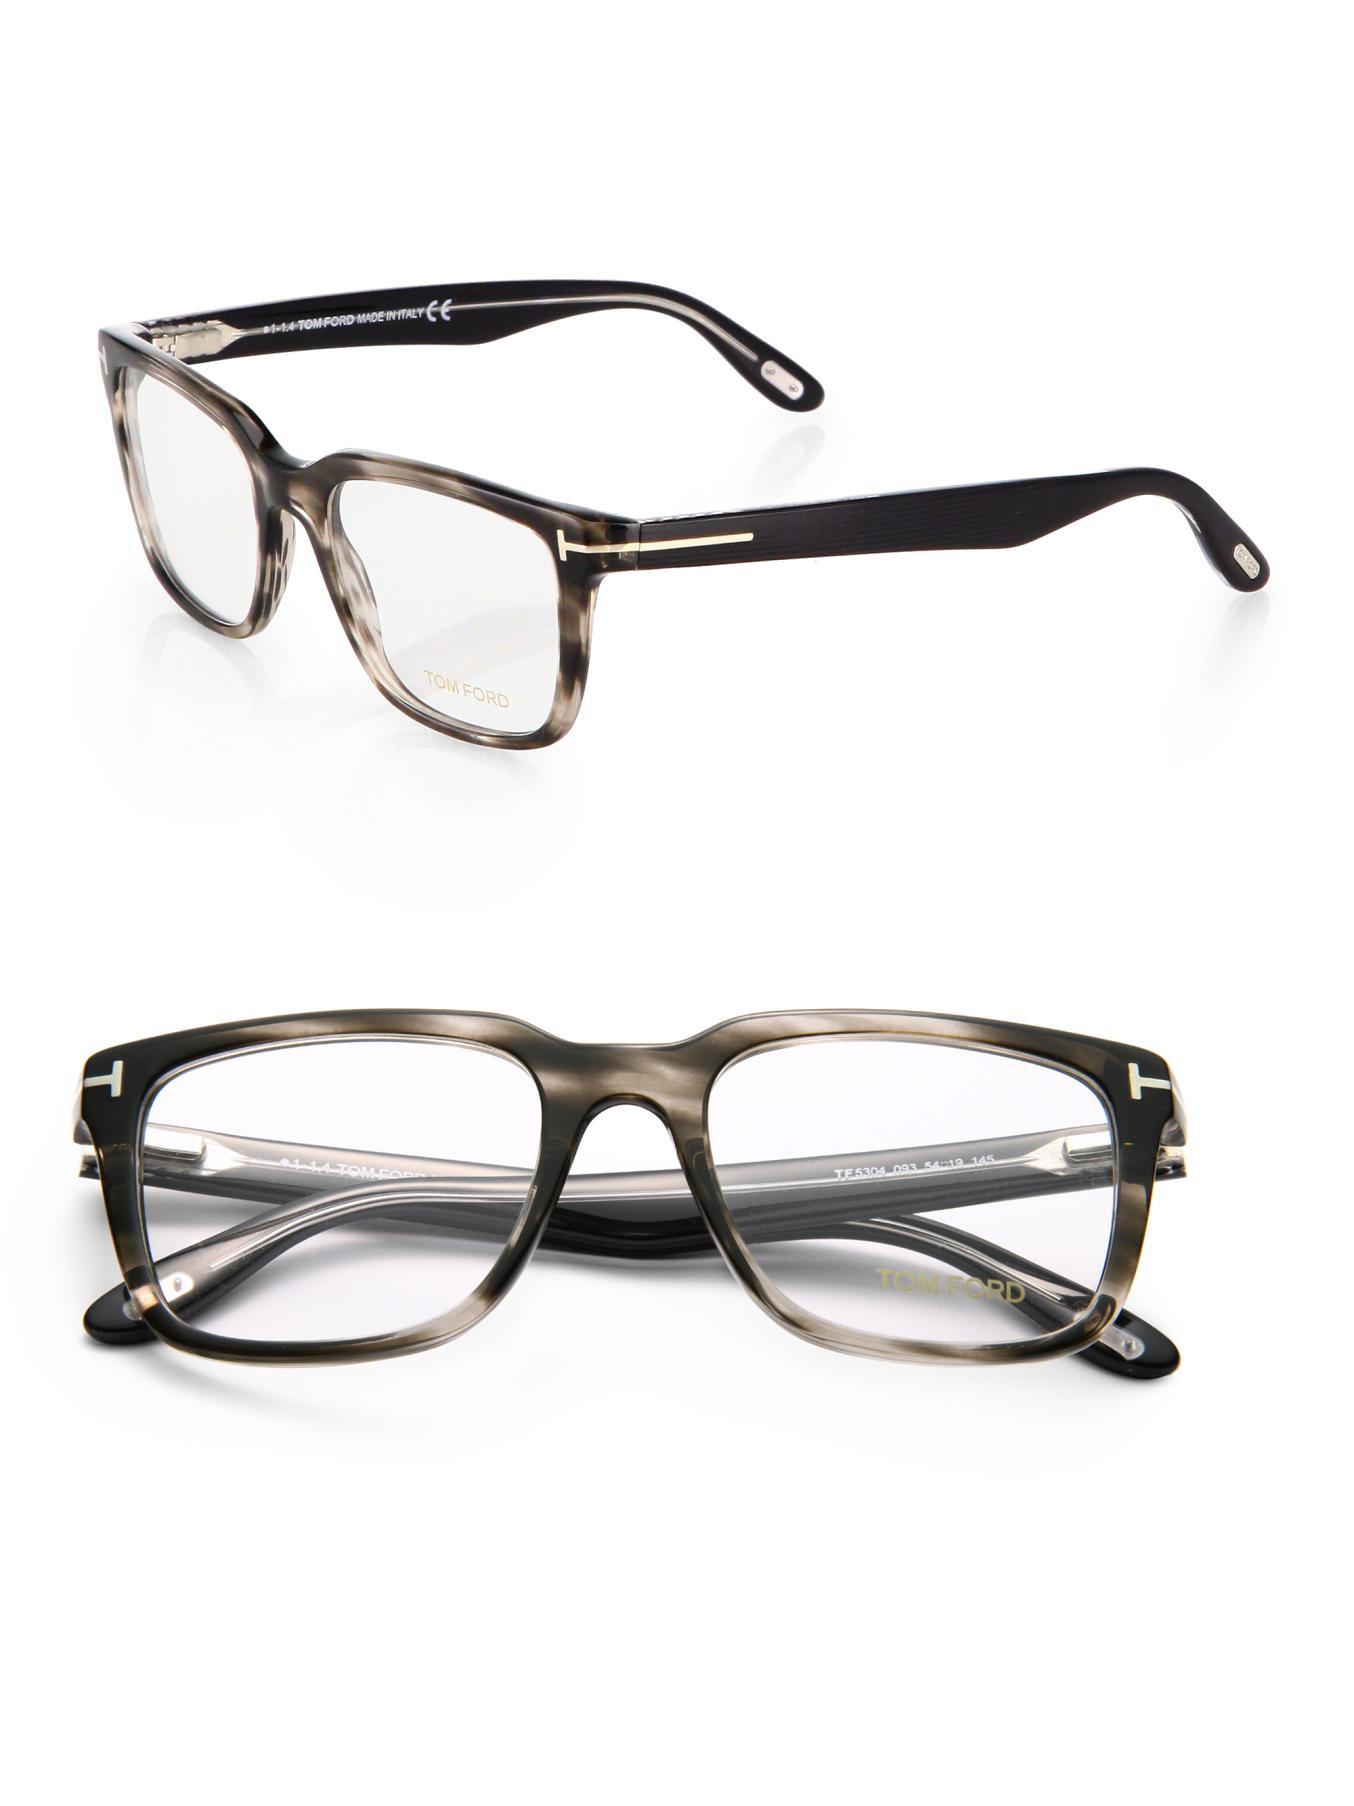 69f55fc25b Lyst - Tom Ford Square Optical Frames in Gray for Men